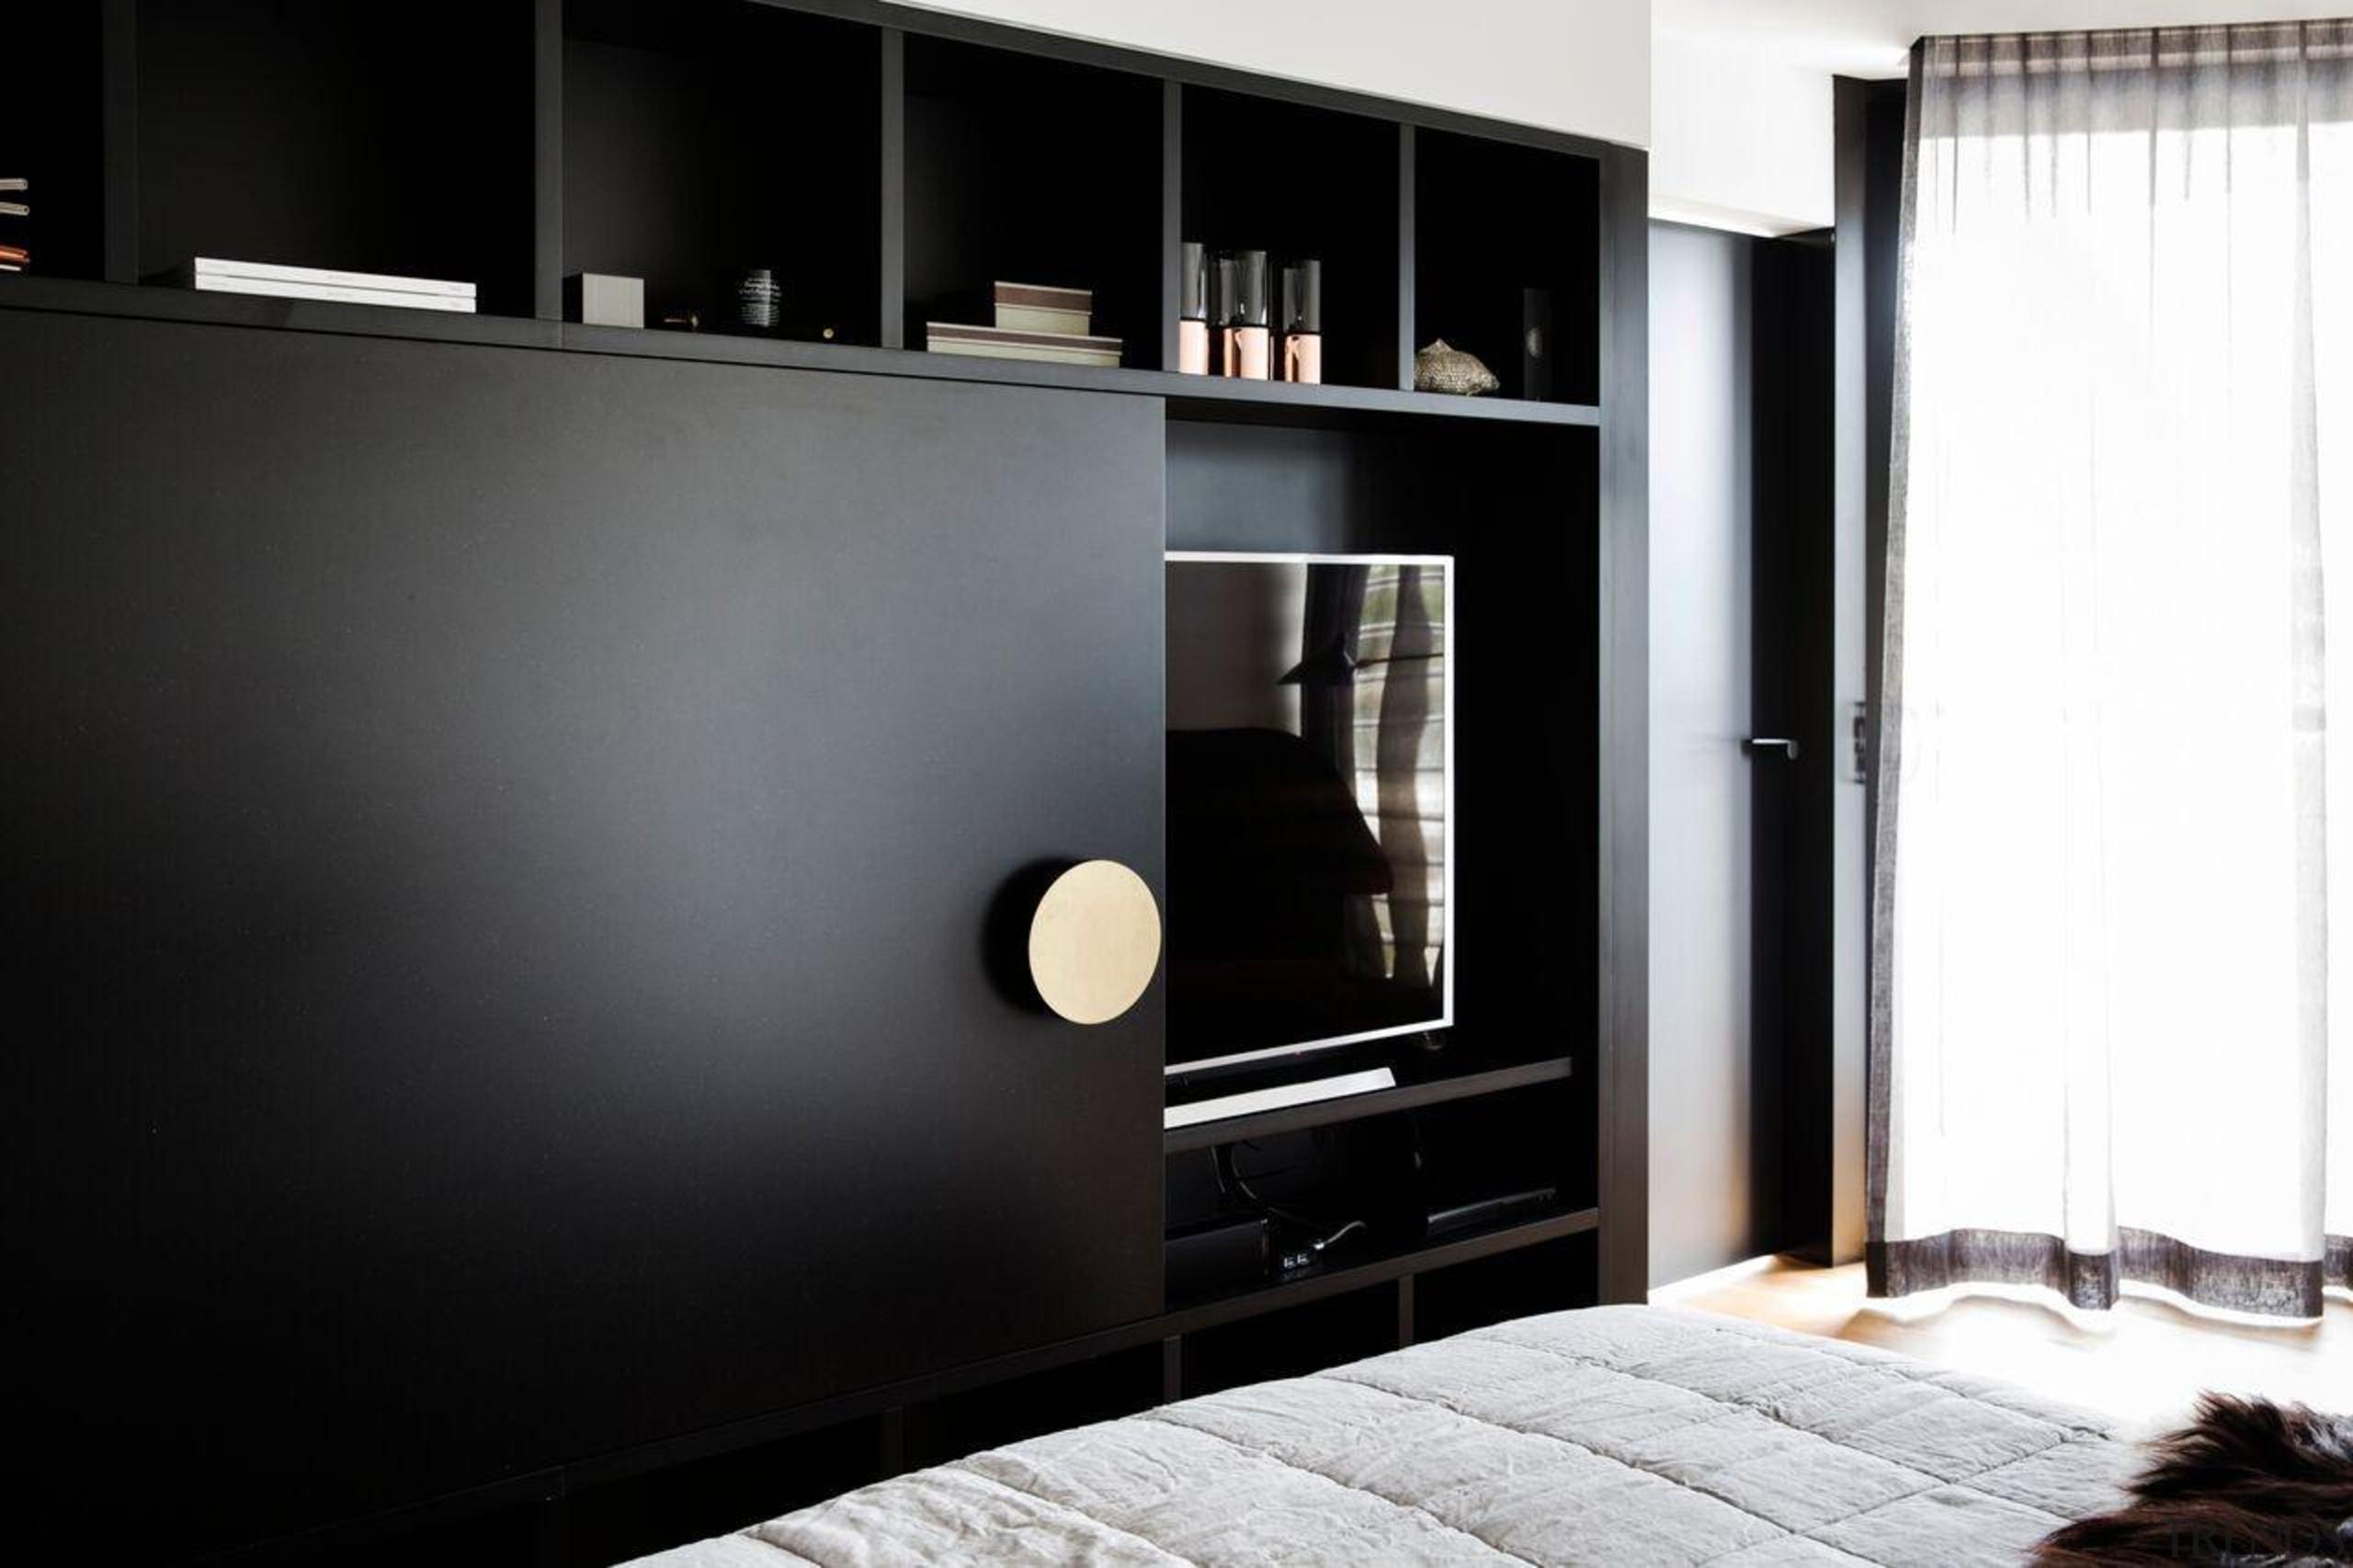 Architect: Architect Prinea - X - furniture | furniture, interior design, room, black, white